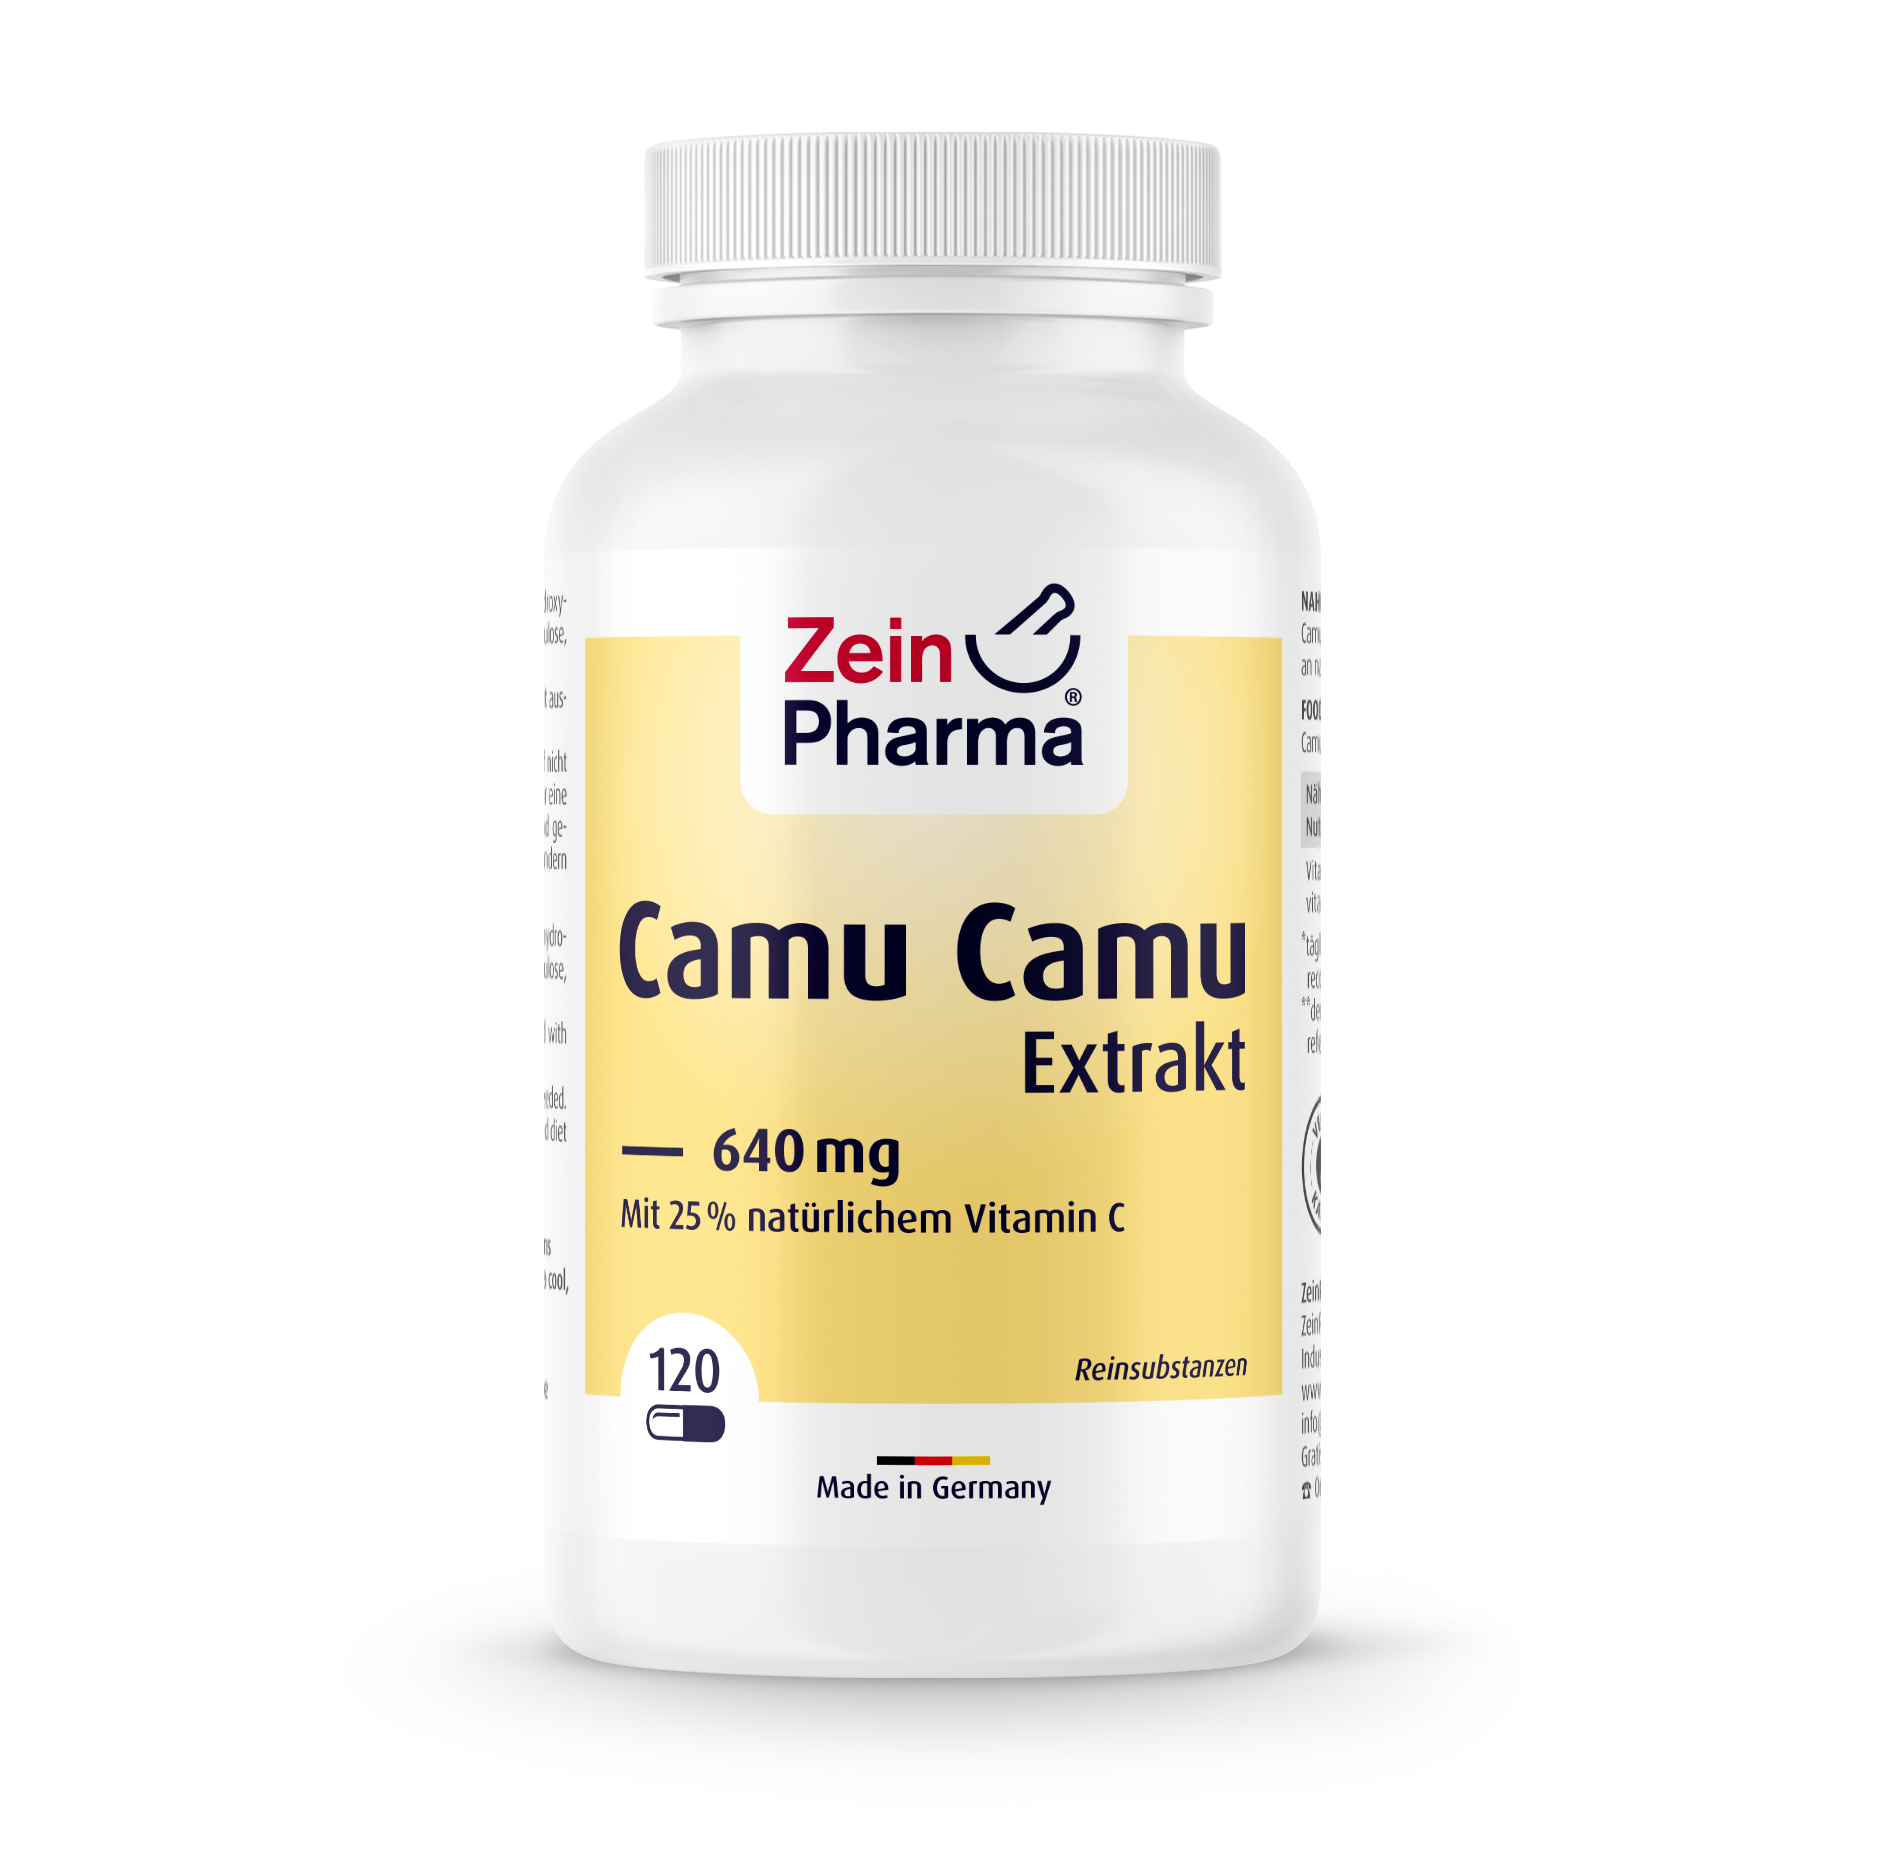 Camu Camu Extract 640 mg Capsules